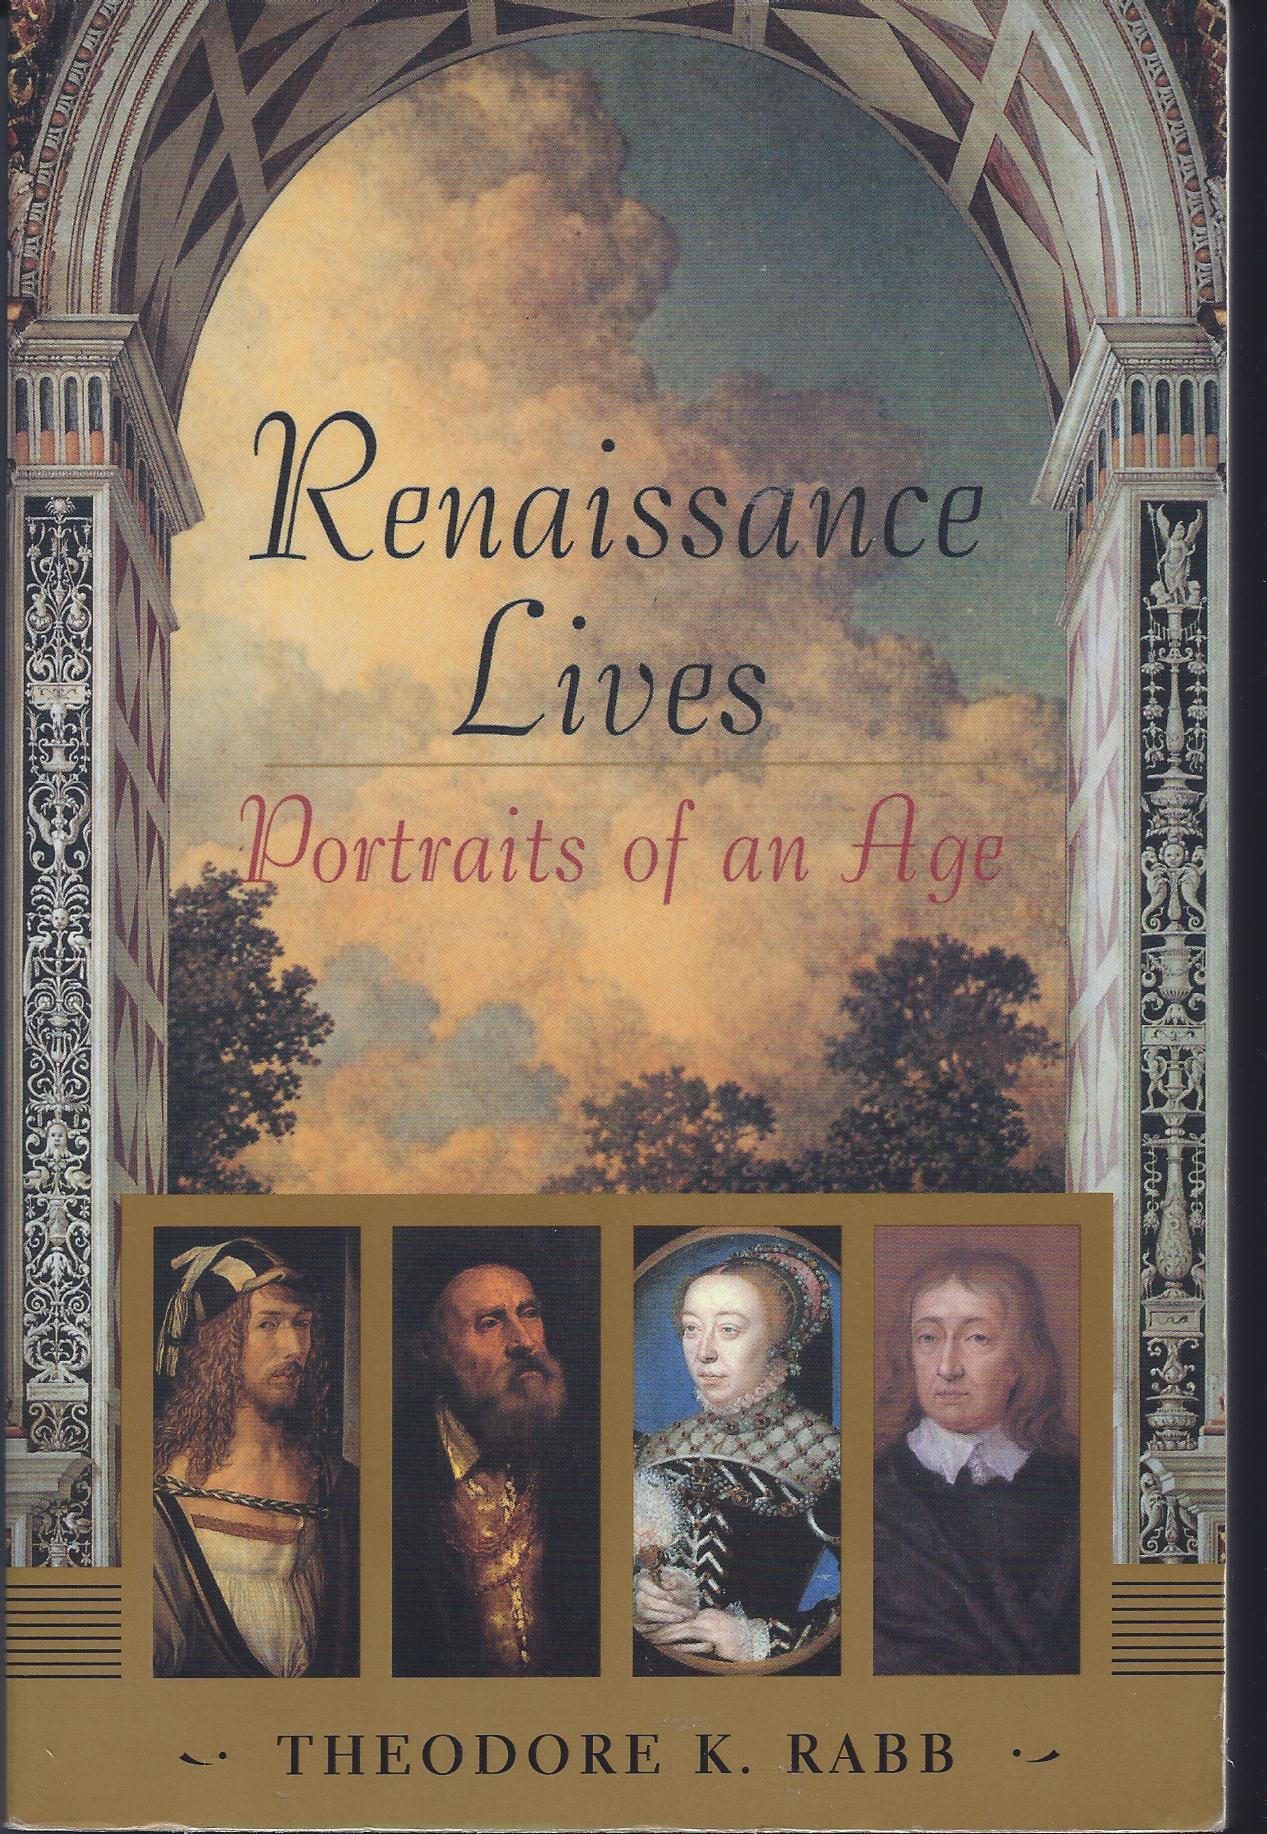 Renessaunce Lives Theodore Kabb